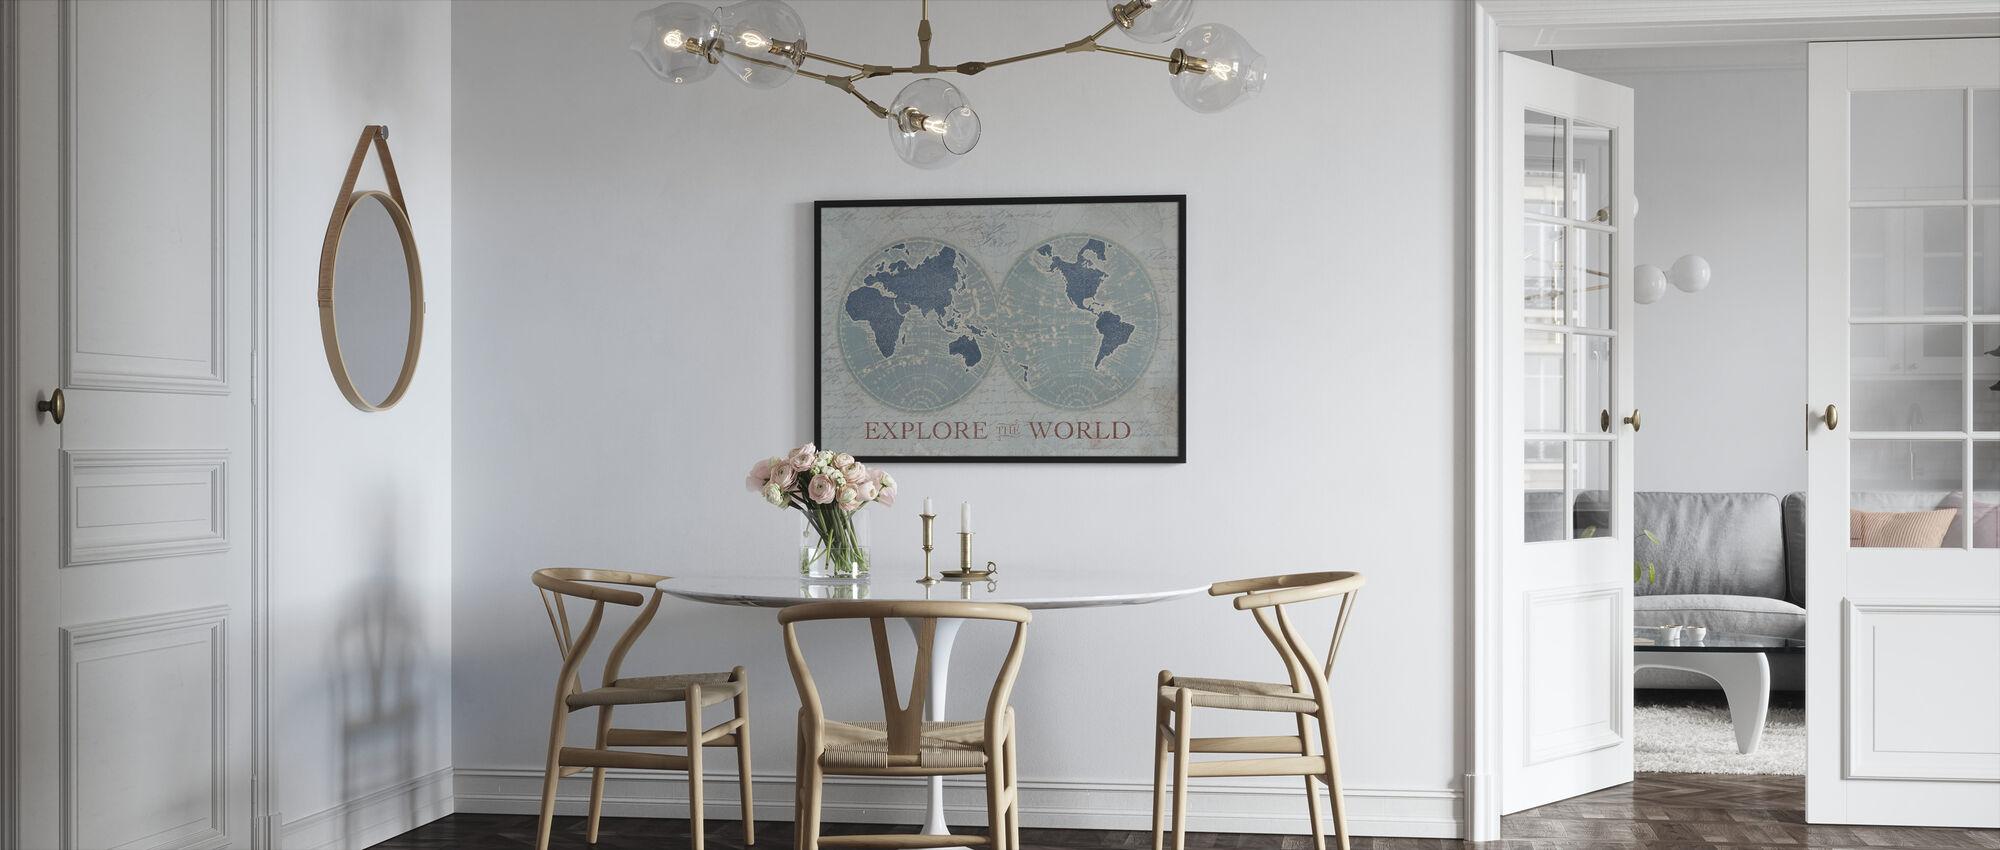 Explore the World 2 - Framed print - Kitchen